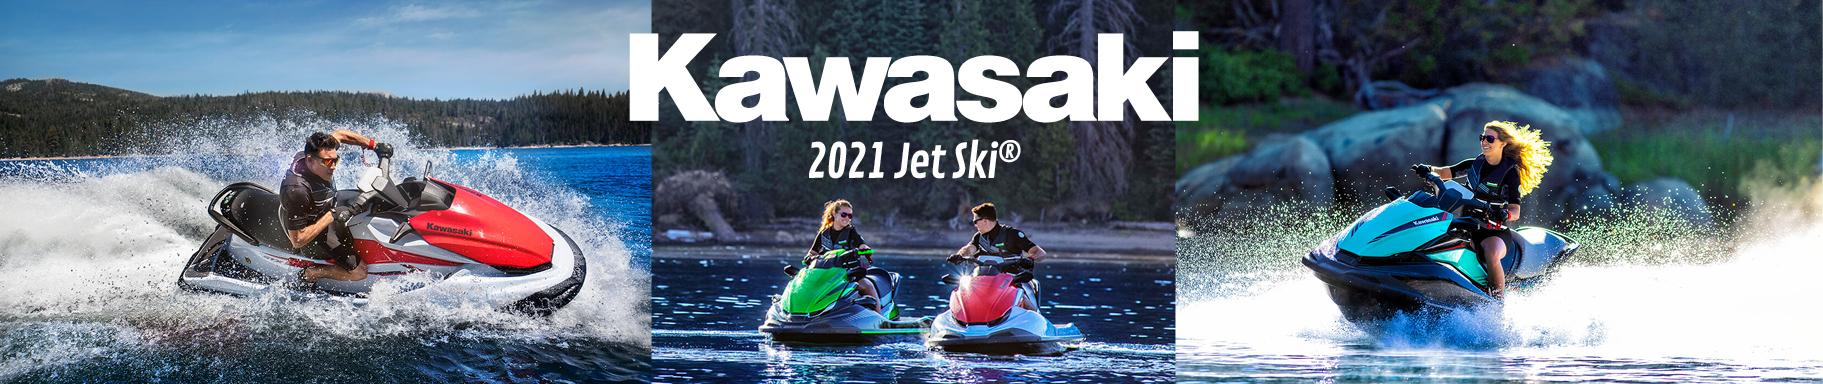 Kawasaki Jet Ski